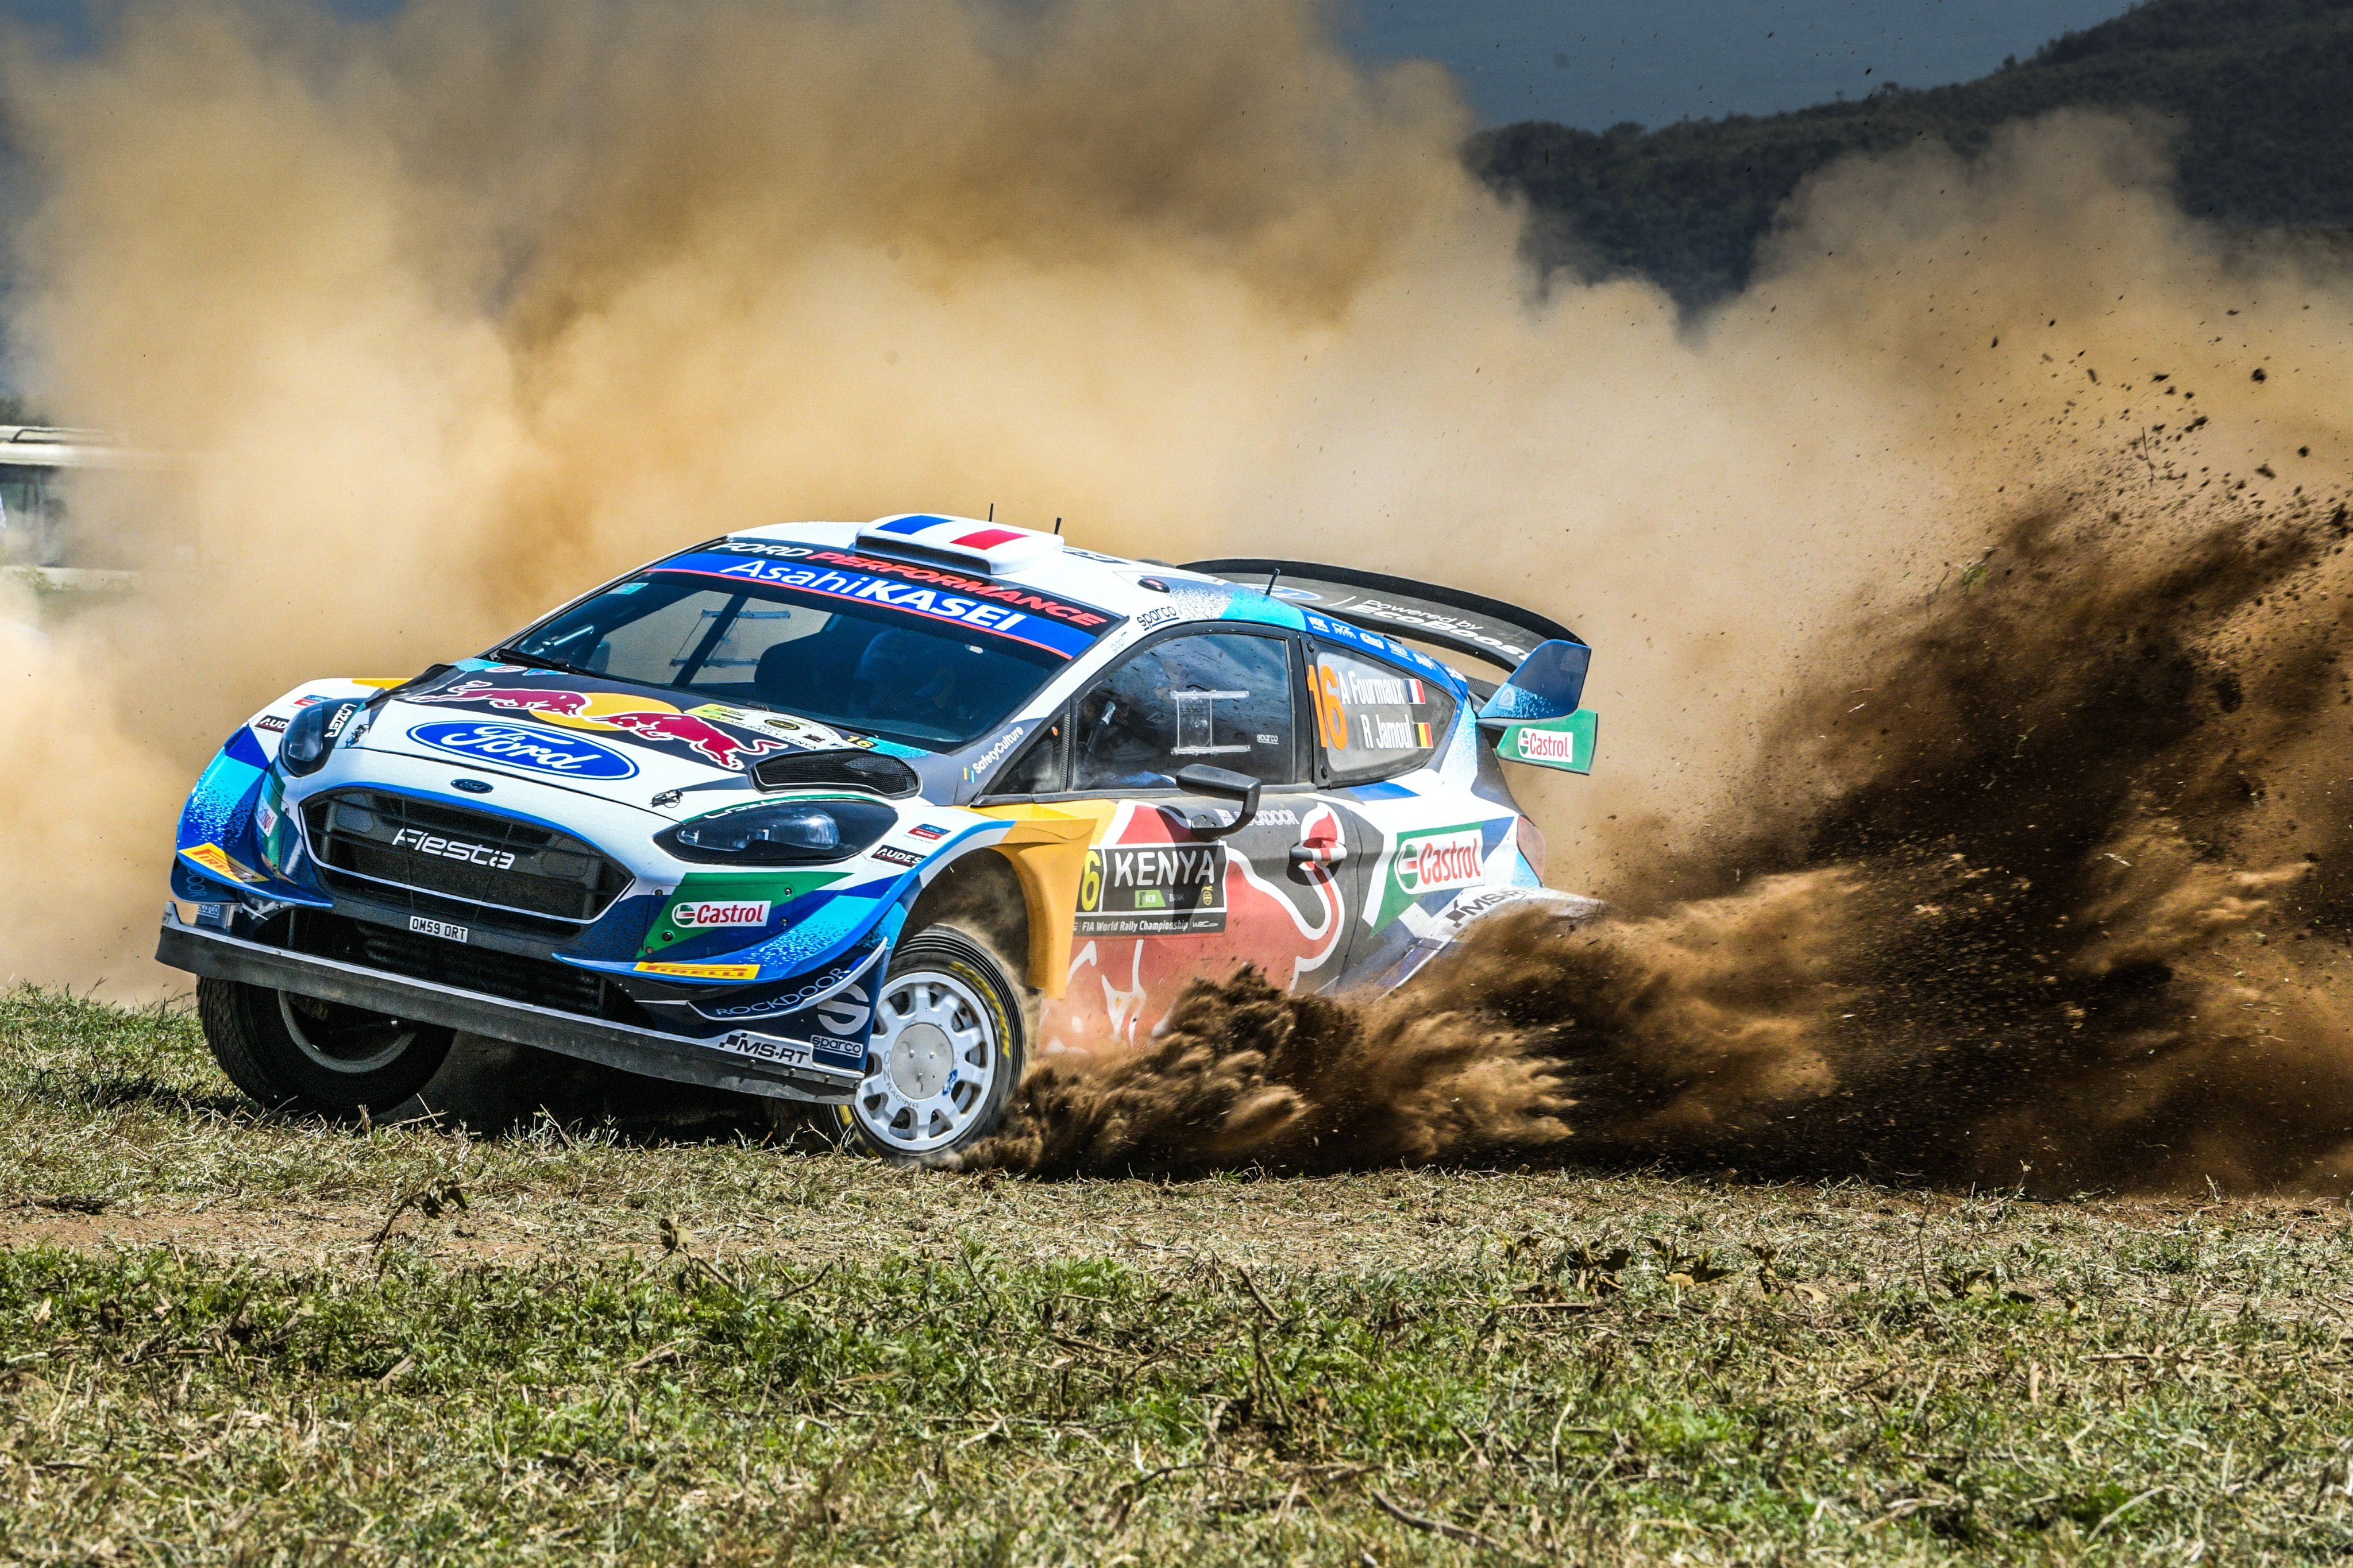 WRC: Safari Rally Kenya [23-27 Junio] - Página 4 E40K7qTX0AMHm5Q?format=jpg&name=4096x4096